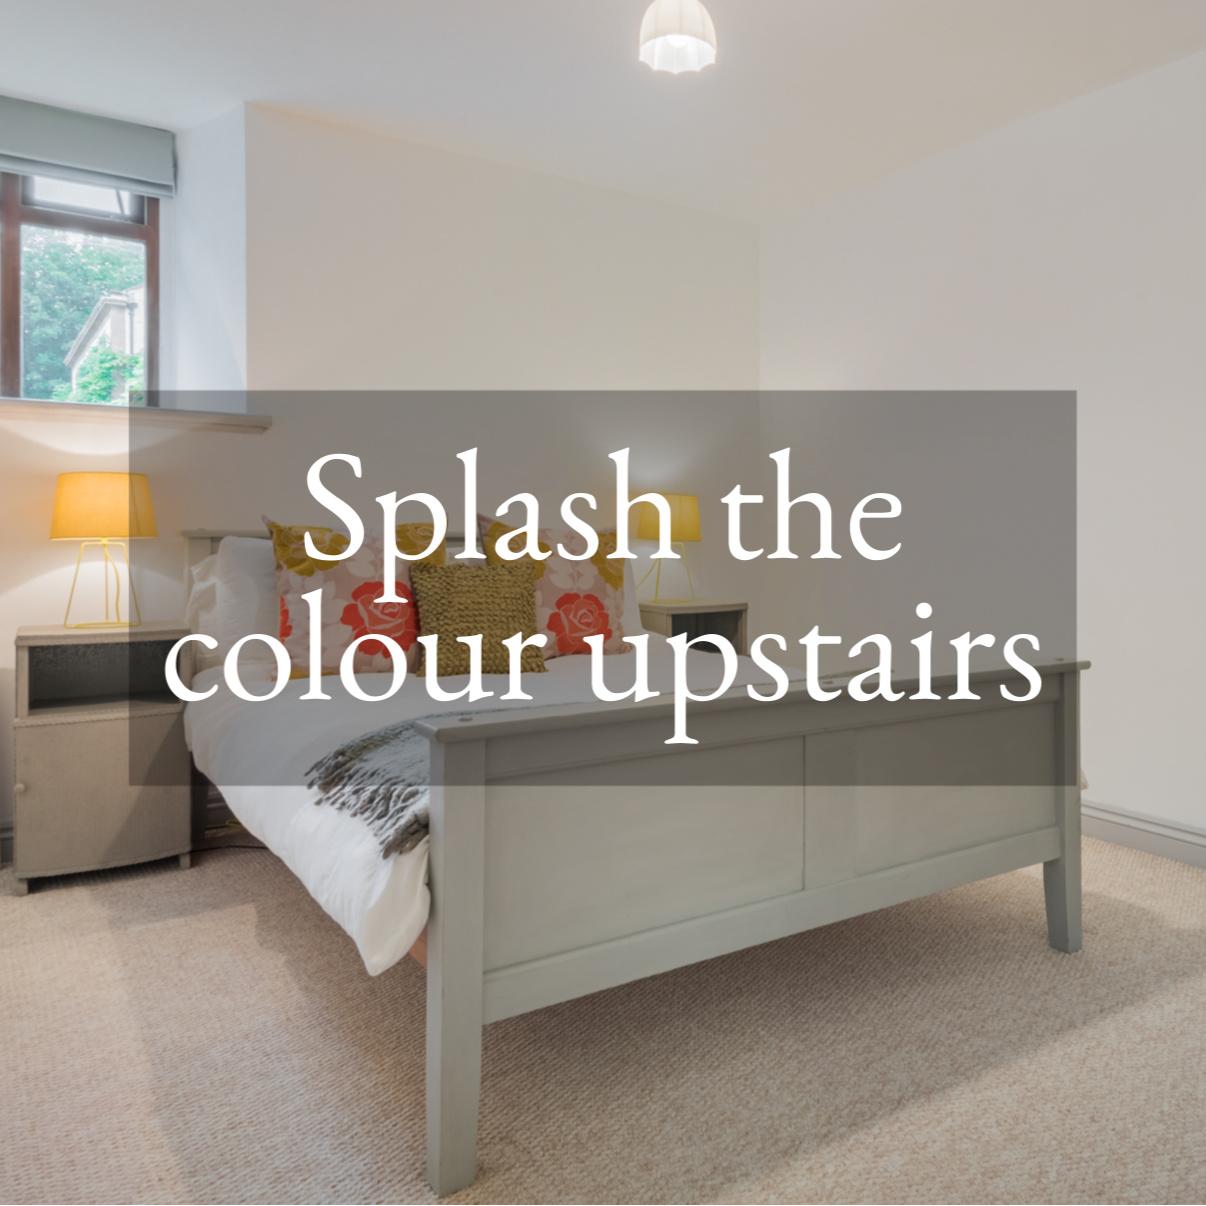 tg5-splash-the-colour-upstairs